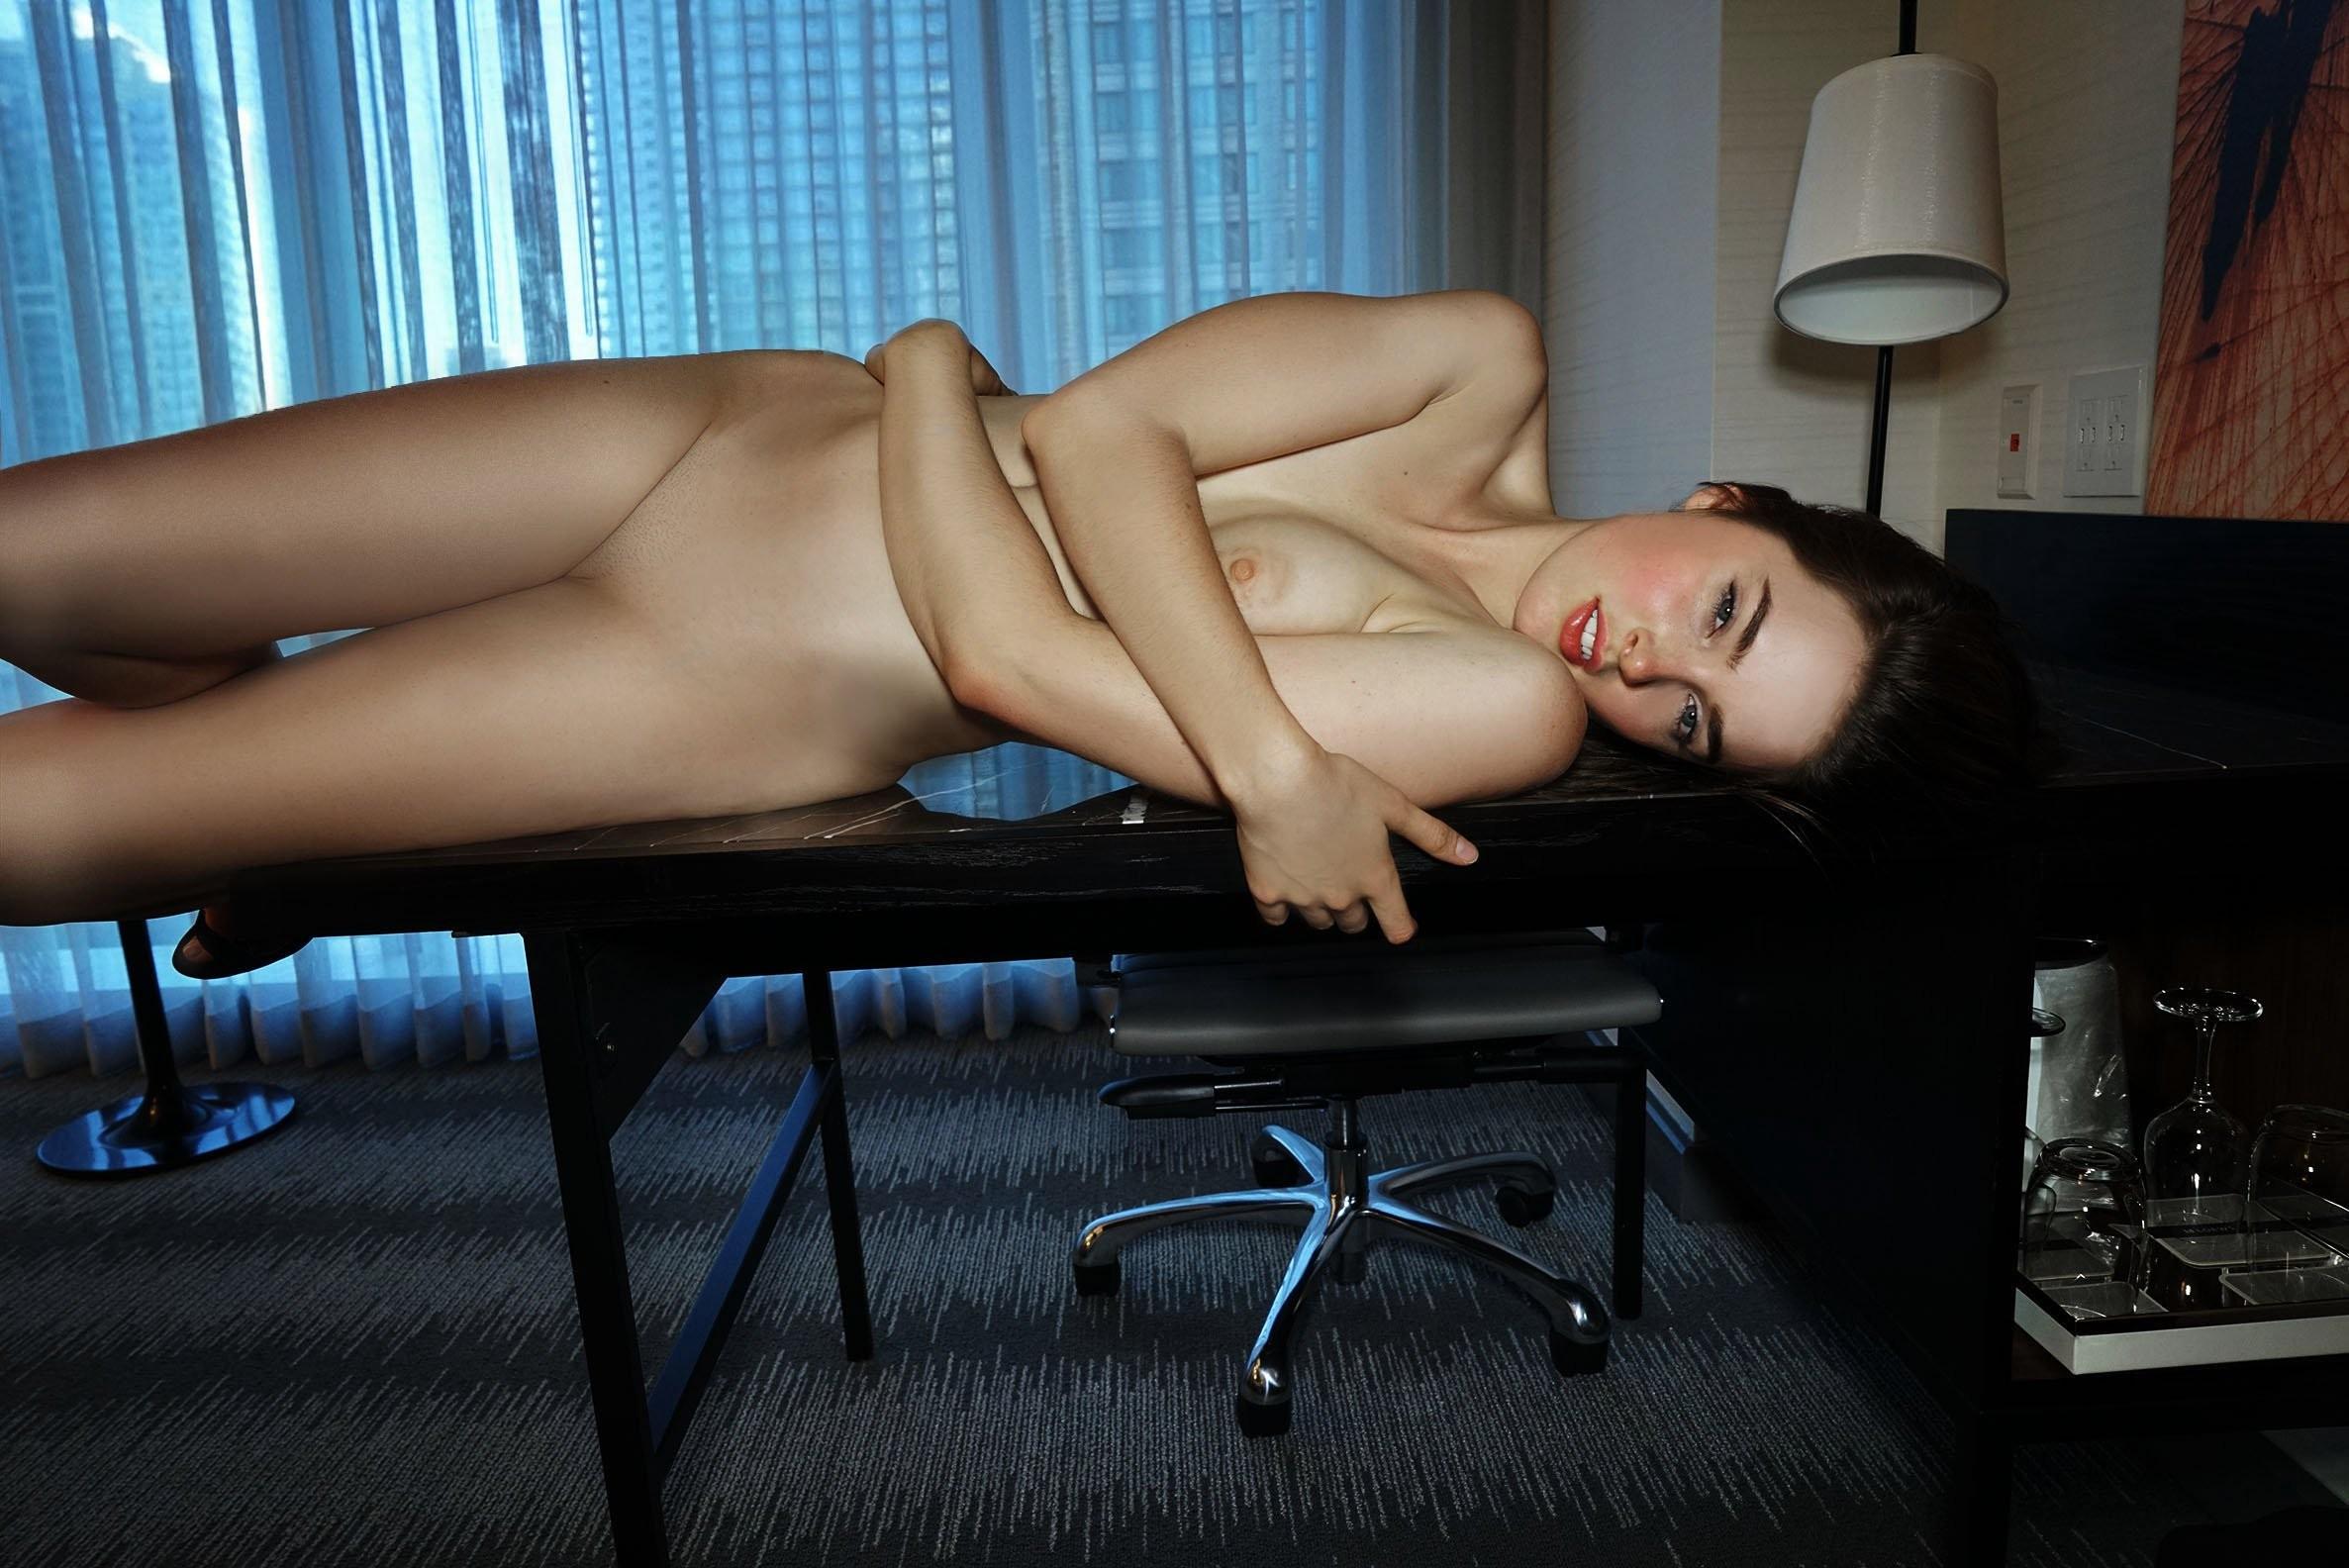 Jessica montoya naked pics